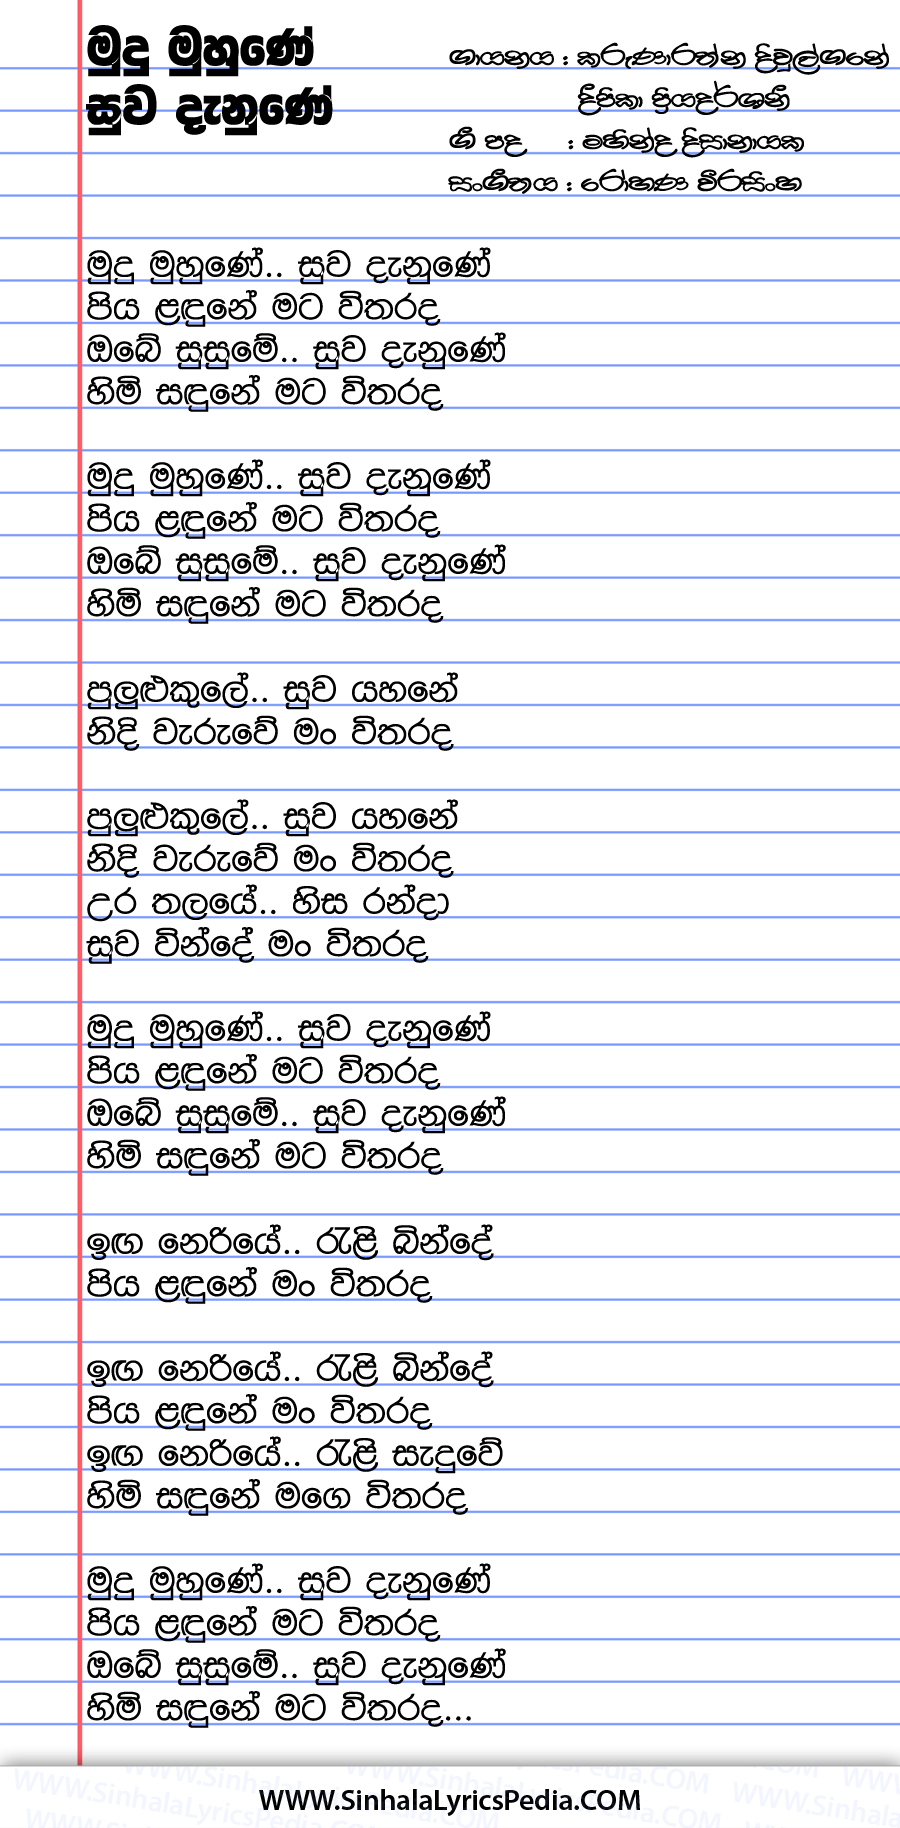 Mudu Muhune Suwa Danune Song Lyrics